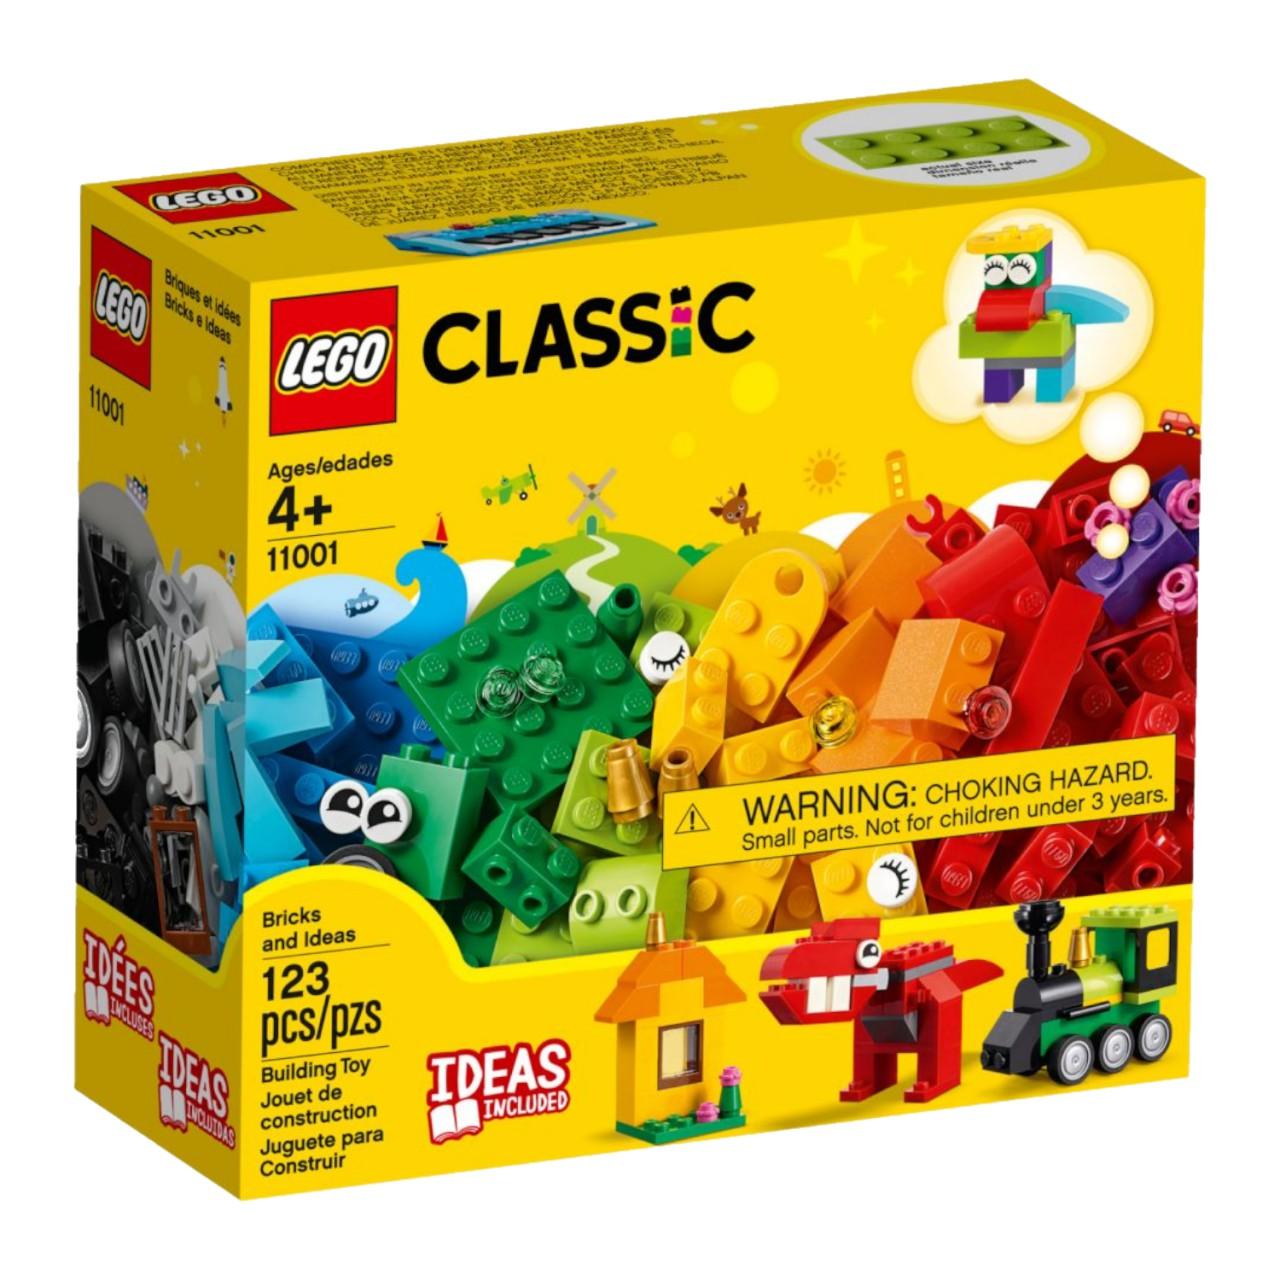 LEGO CLASSIC 11001 Bausteine